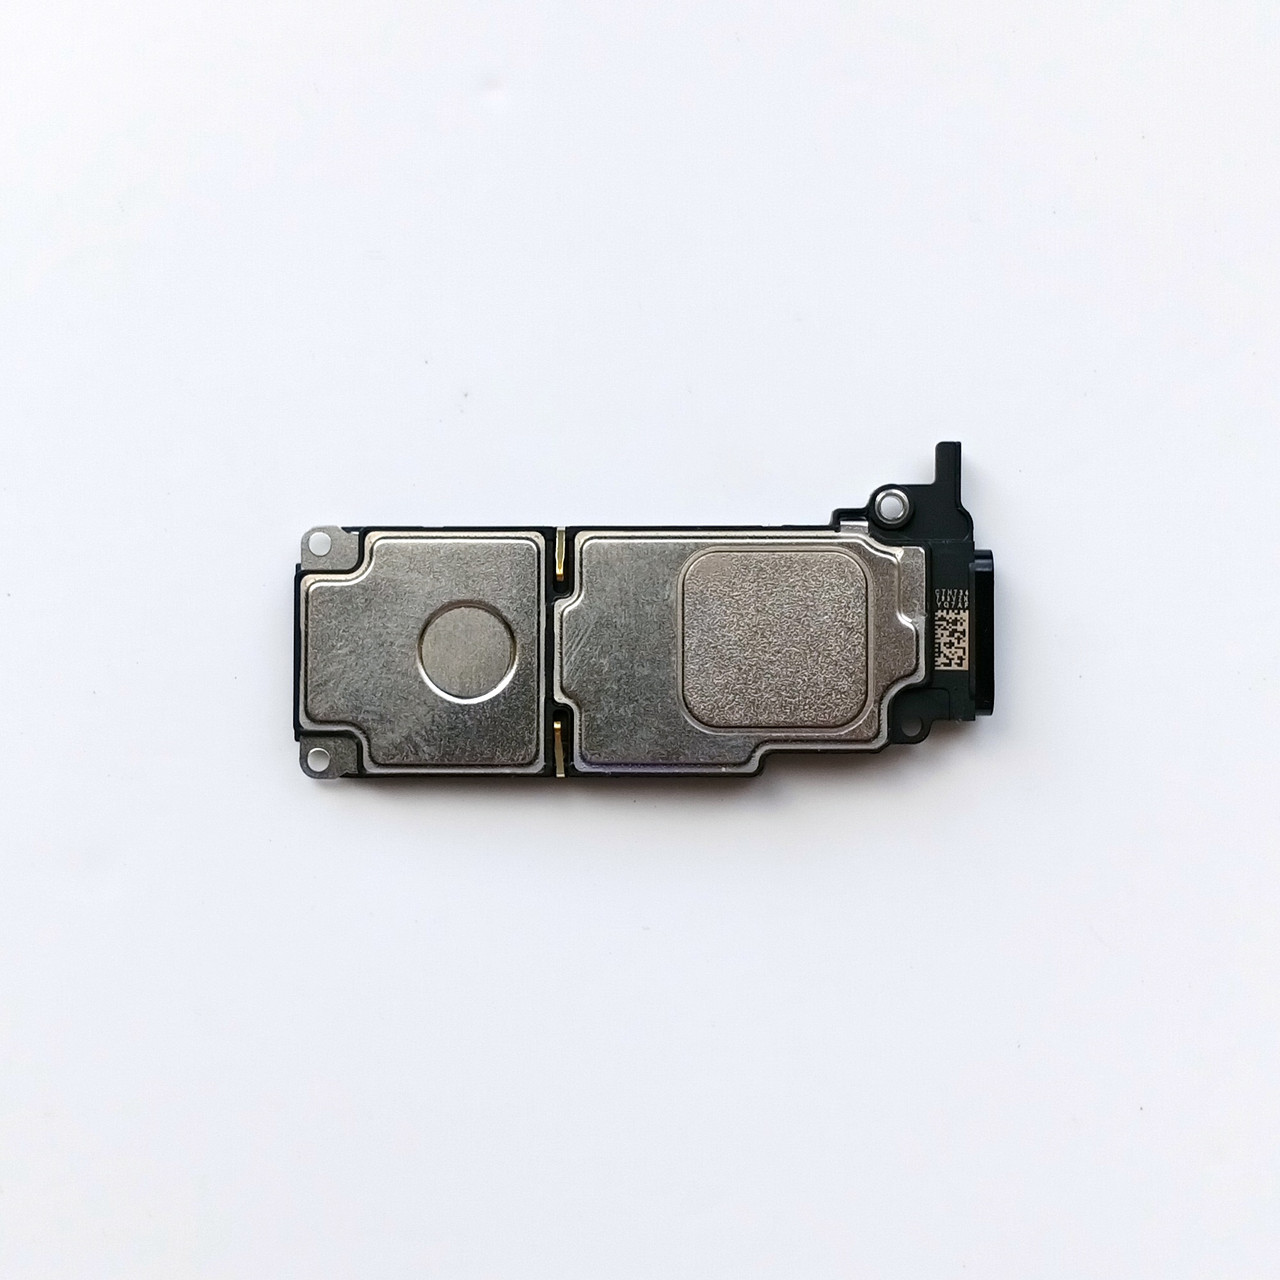 Дзвінок Apple iPhone 8 Plus